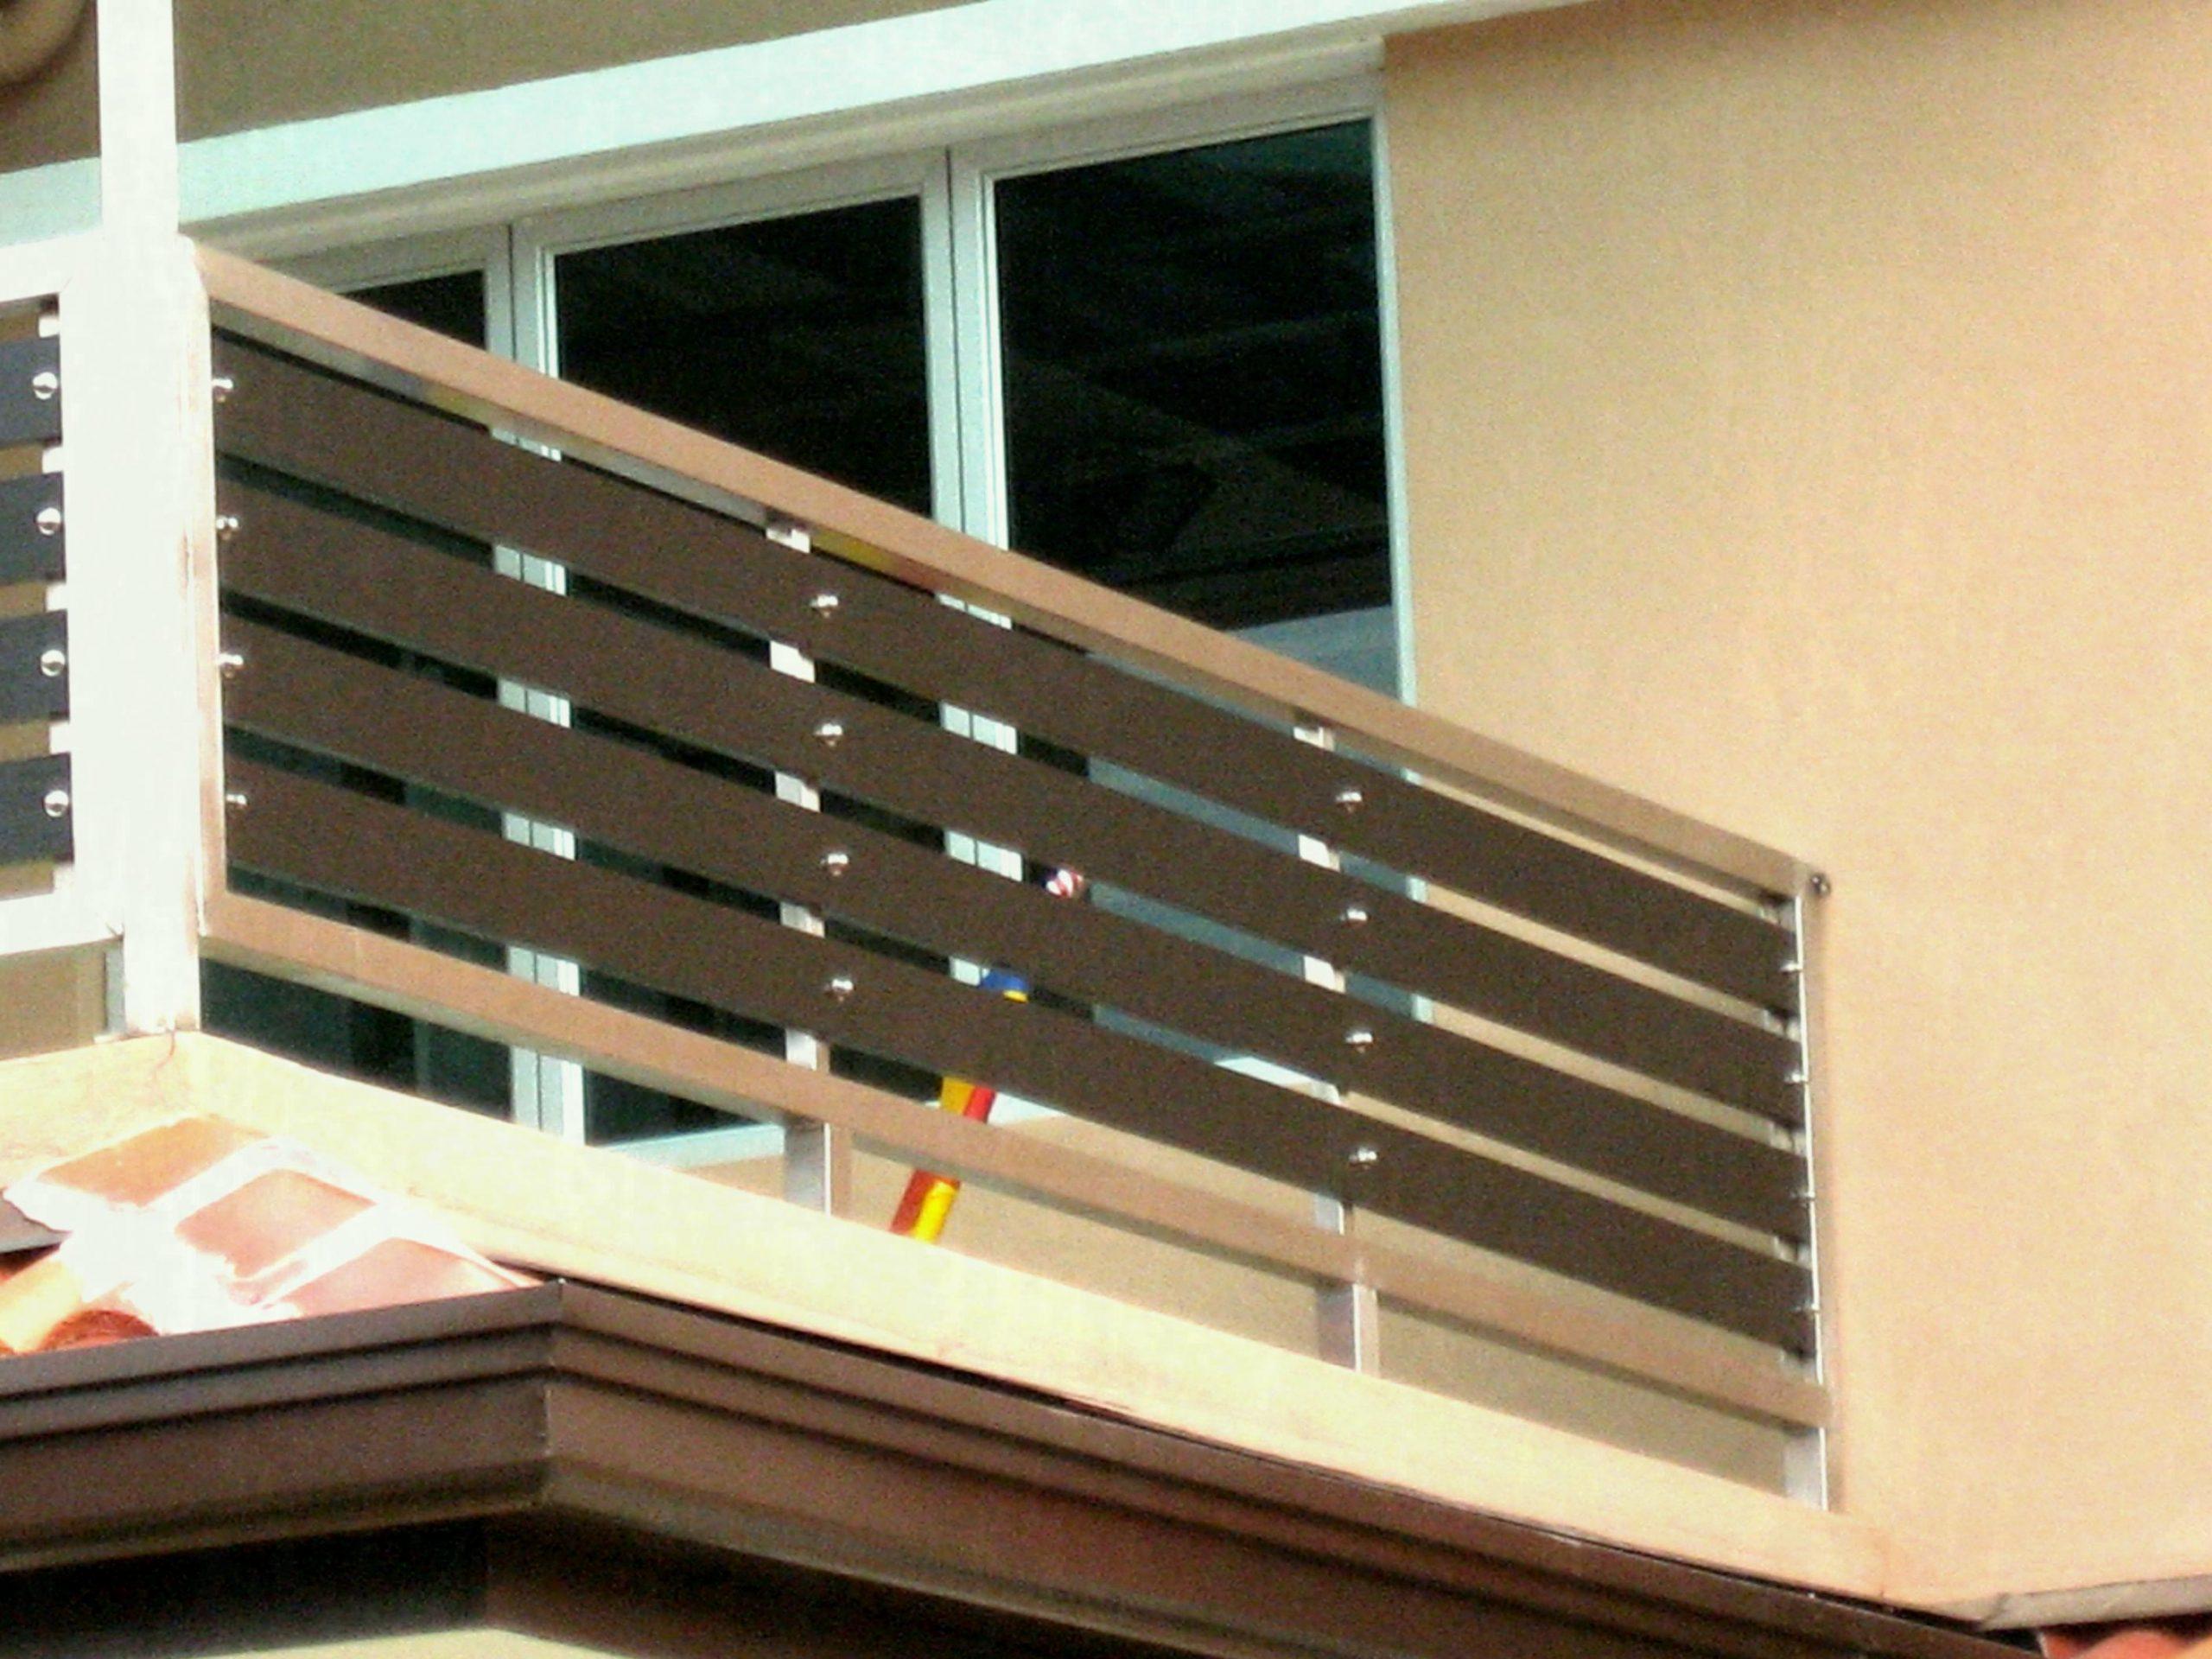 balcony grill design for house Balcony Download Balcony Grill Design For House Images